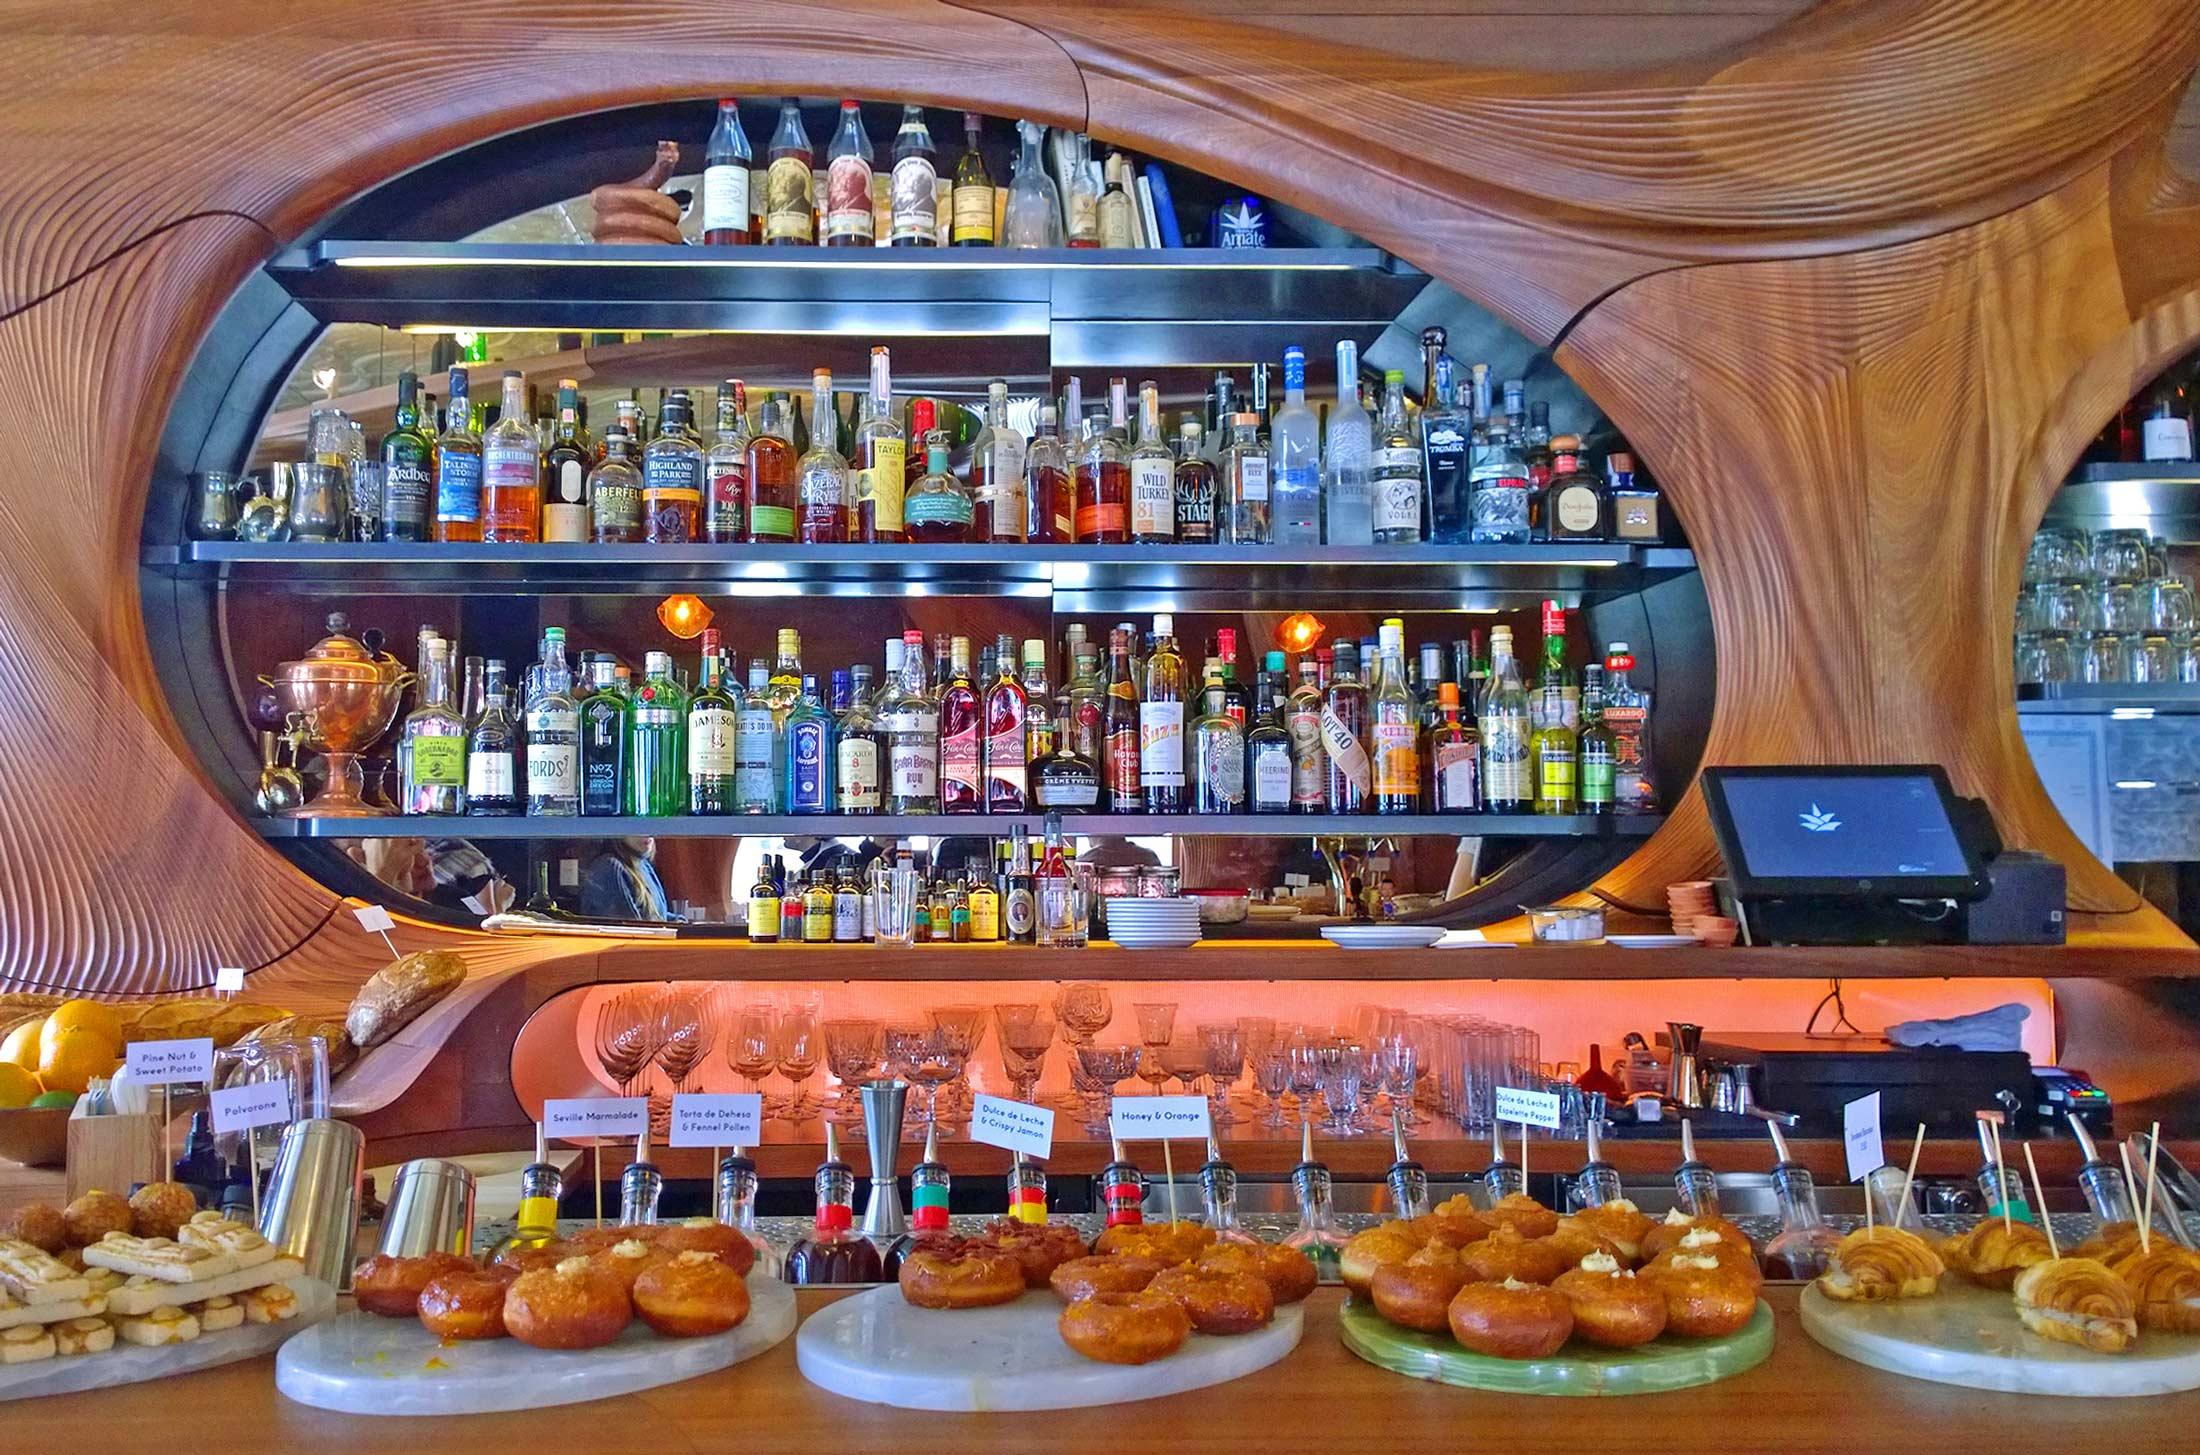 Bar-Raval-Toronto---Focal-Journey-(by-Gustavo-Espinola)